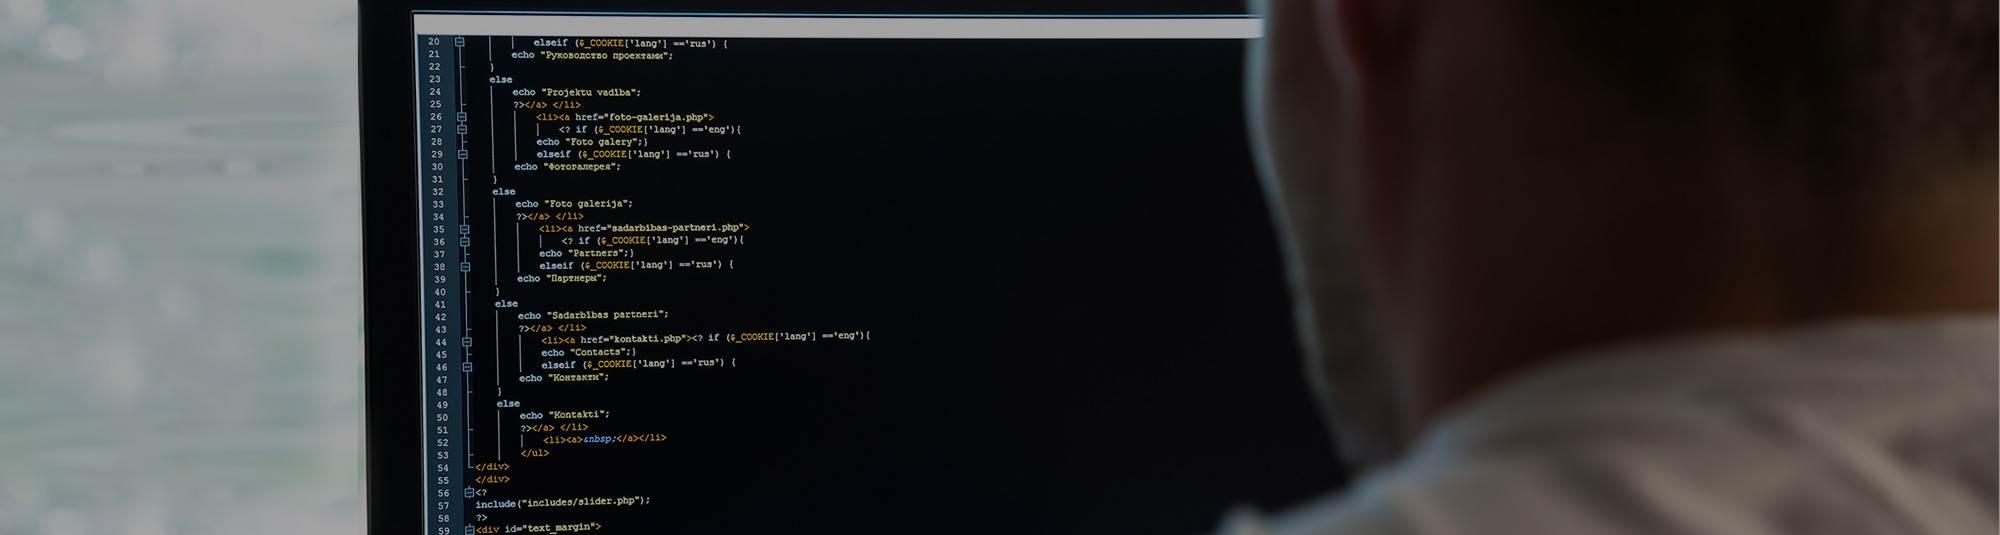 Hire CodeIgniter Developers | Hire Expert Codeigniter Web